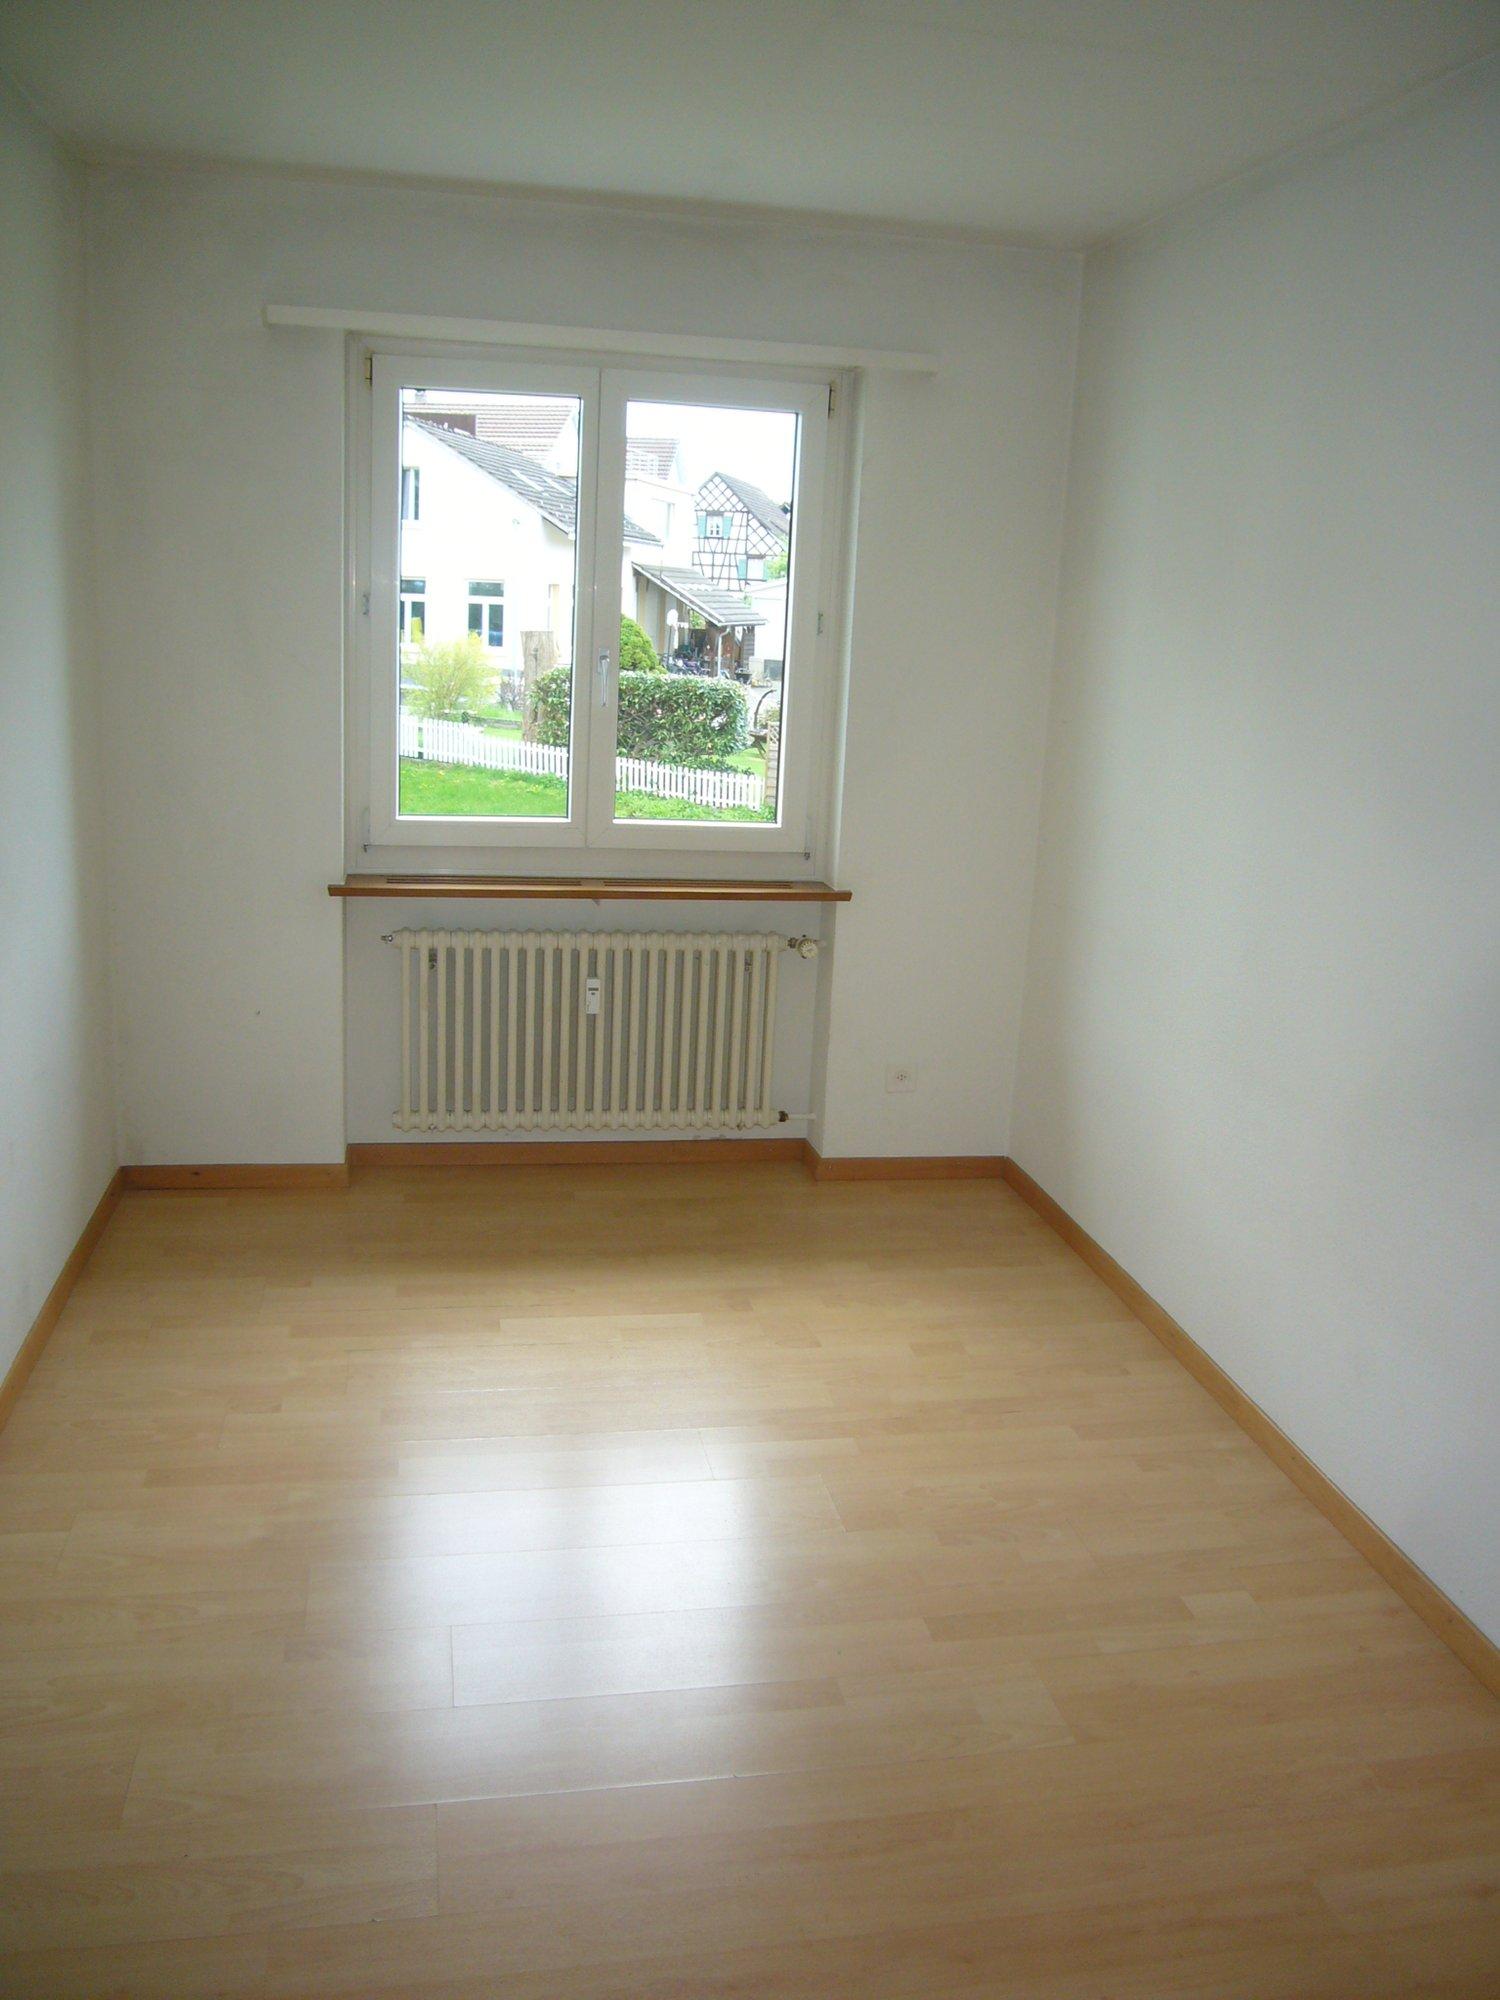 Morgentalstrasse 9